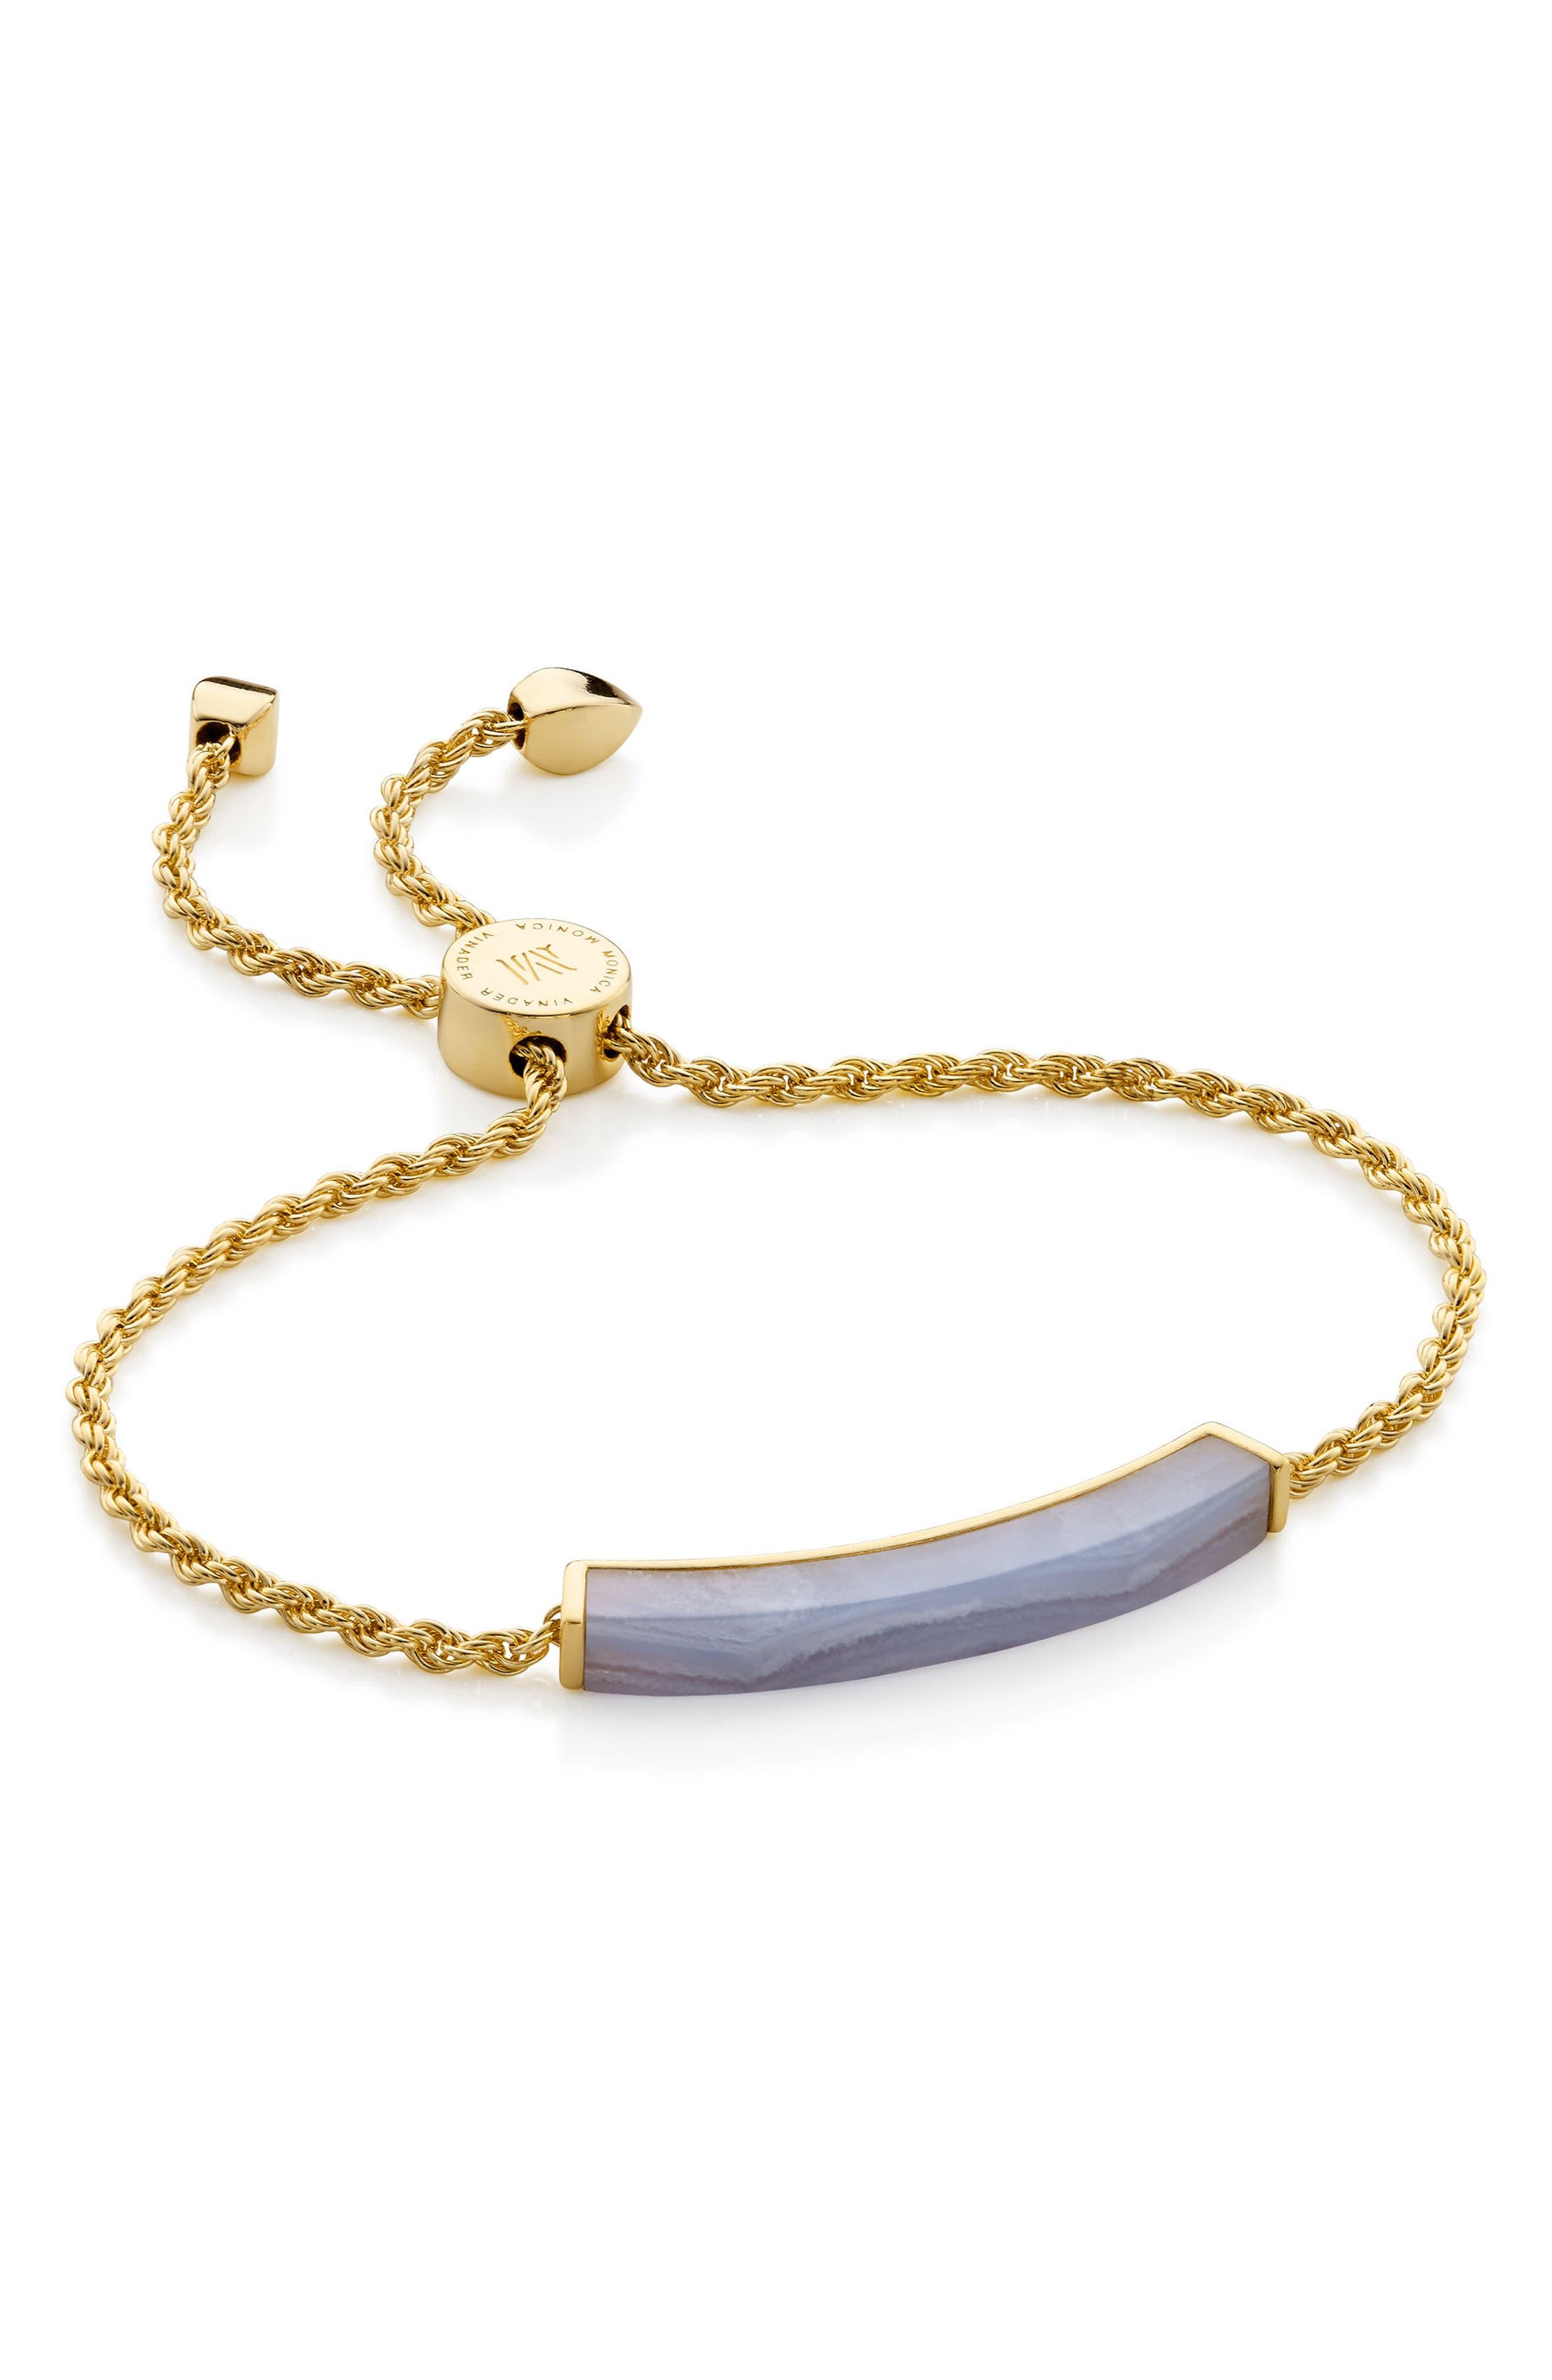 Linear Semiprecious Stone Friendship Bracelet,                             Main thumbnail 1, color,                             GOLD/ BLUE LACE AGATE